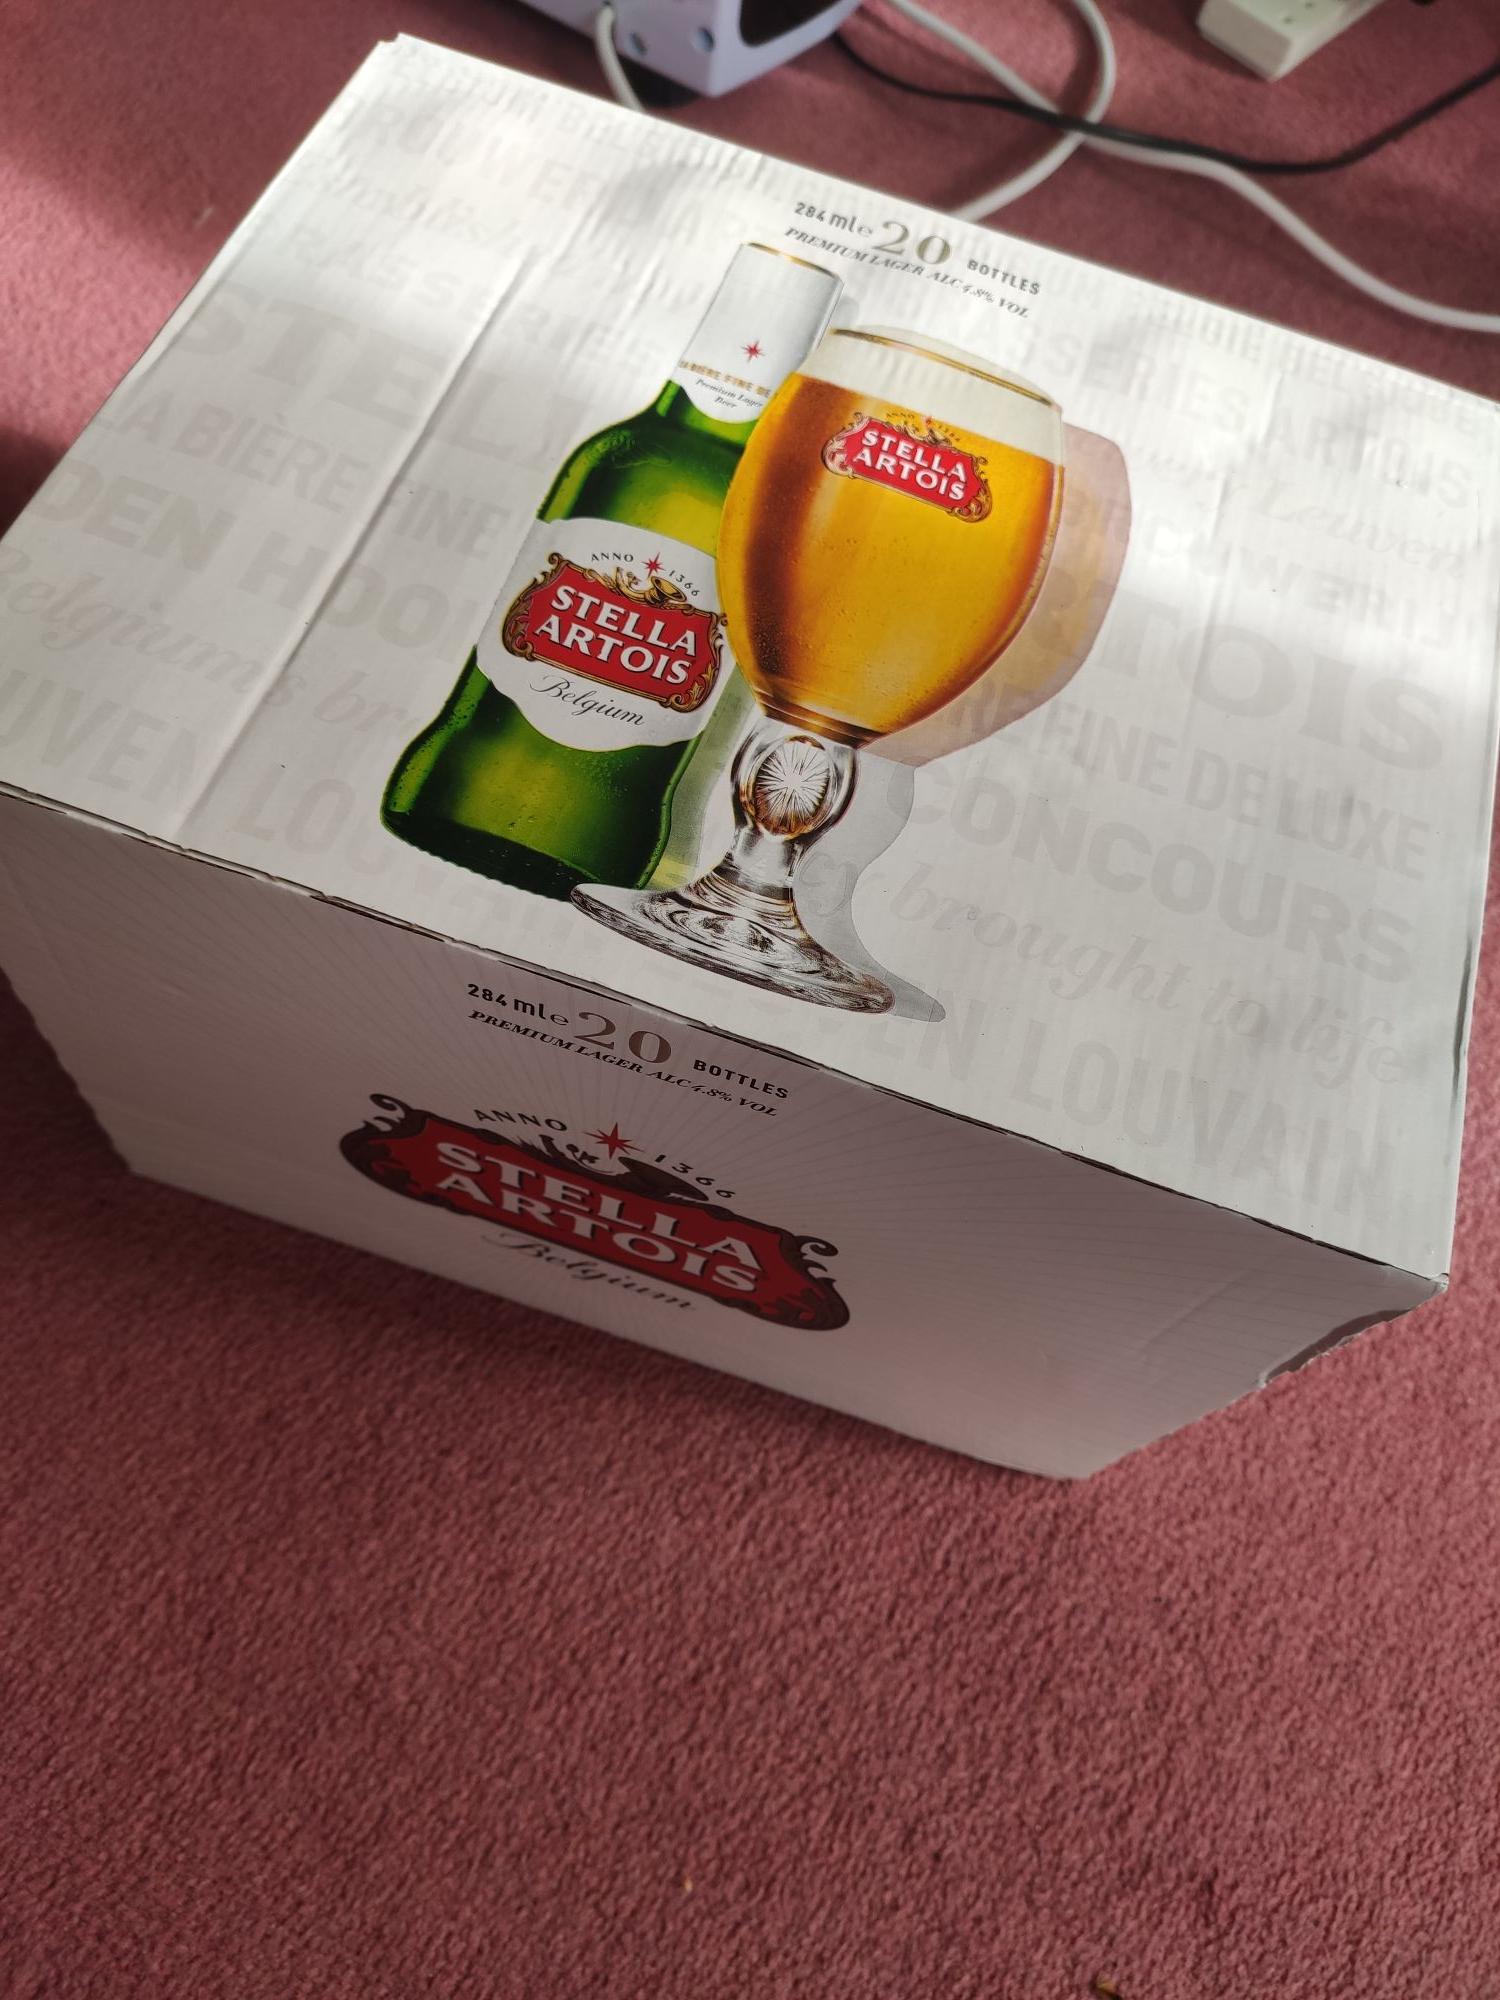 Stella Artois 20x284ml £9.99 at Lidl Acton, London